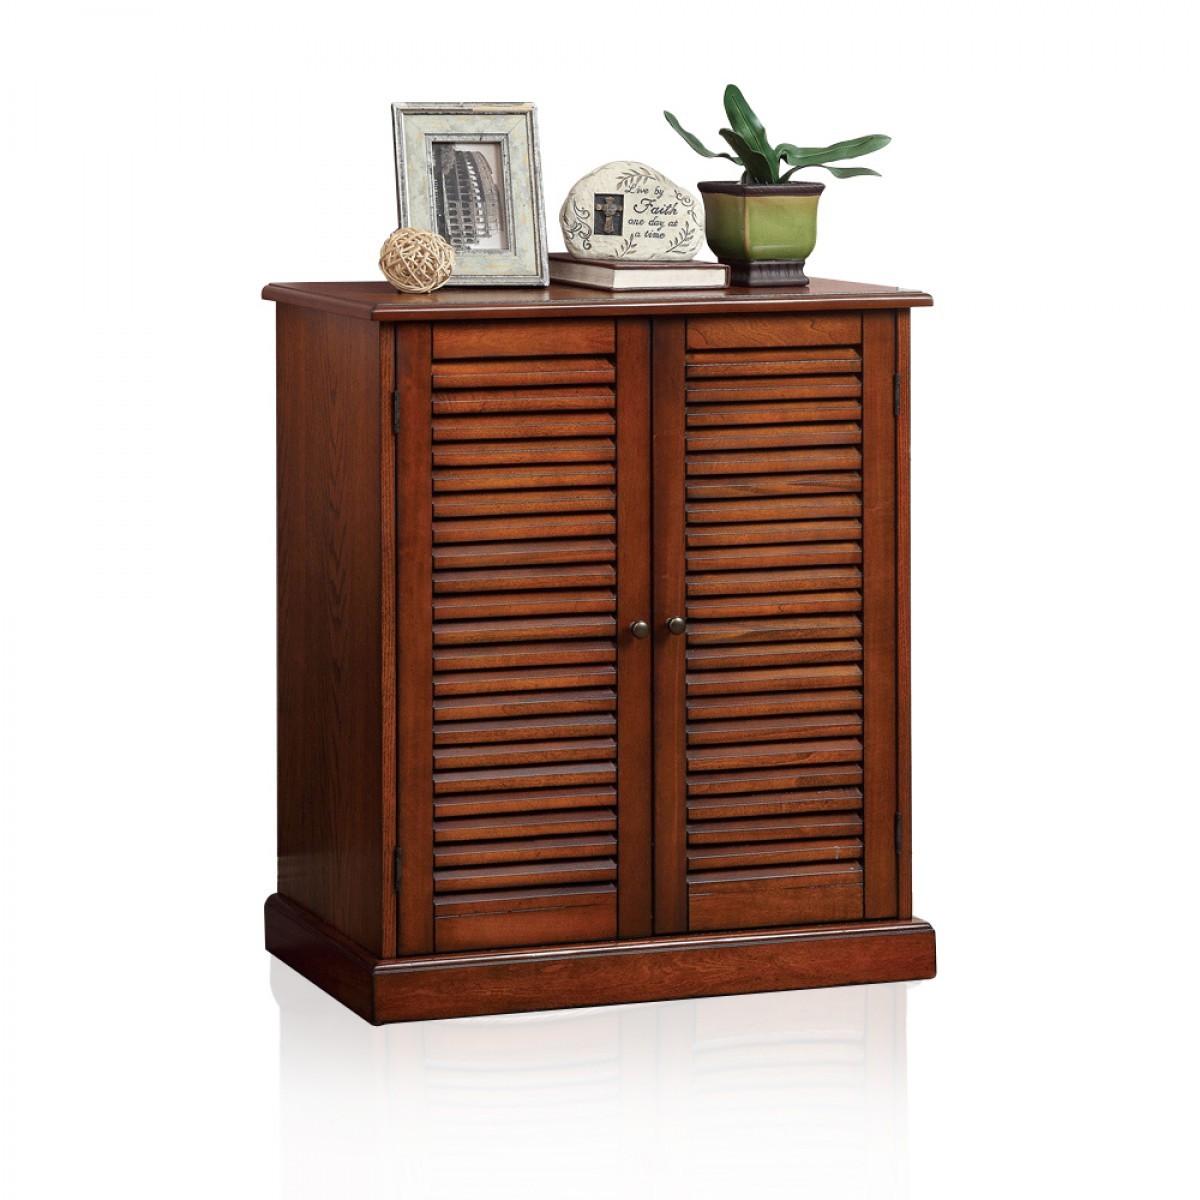 Walkabout 5-shelf Shoe Cabinet Brown